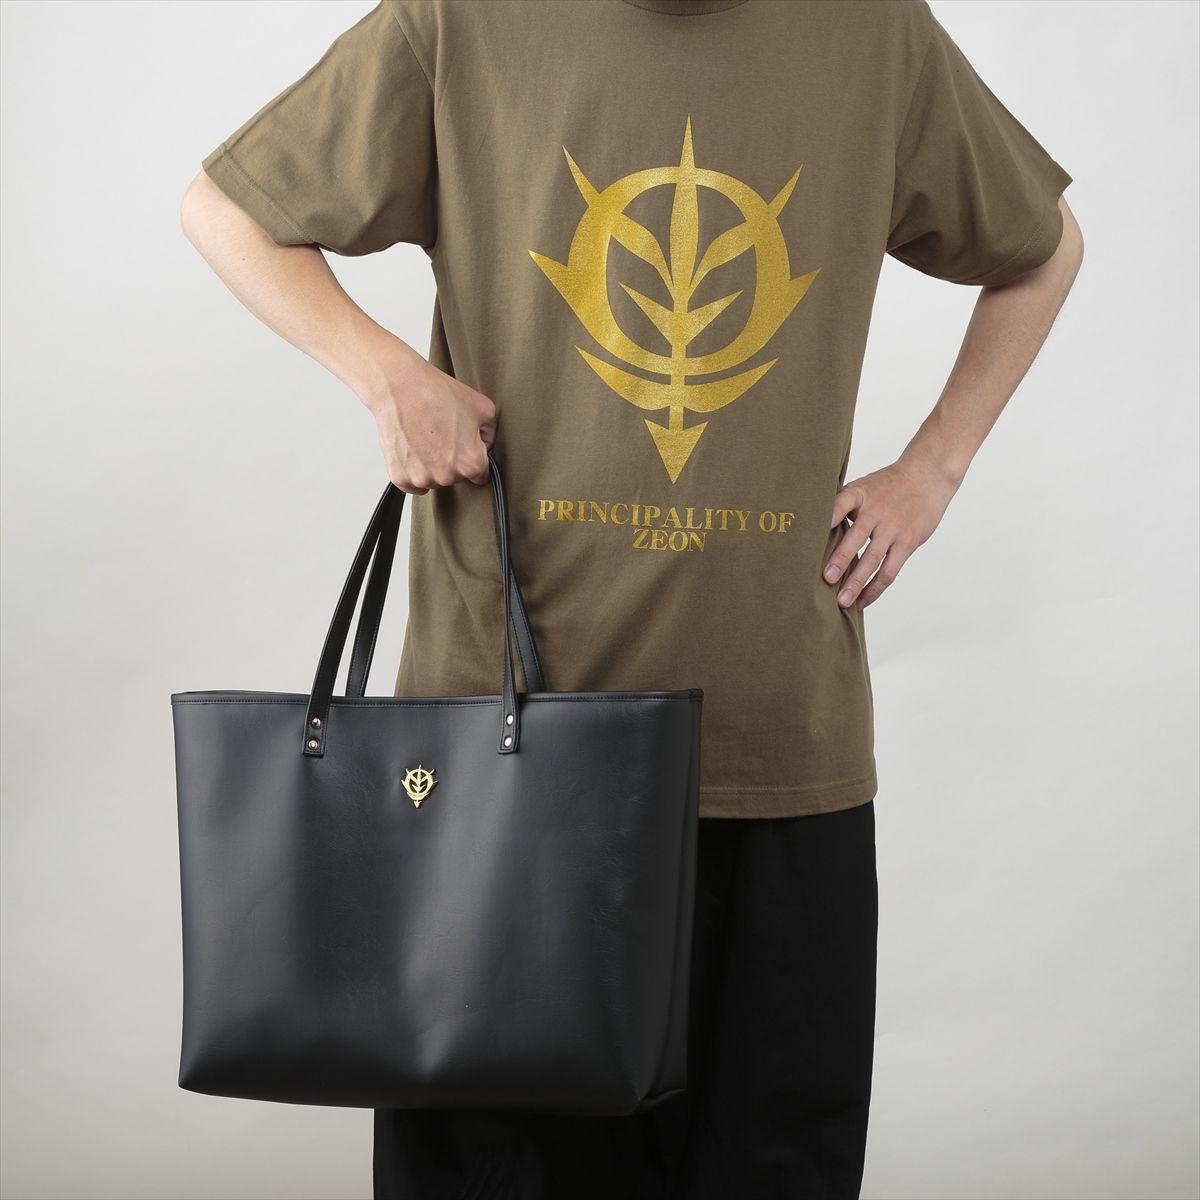 Mobile Suit Gundam Zeon Golden Emblem Handbag